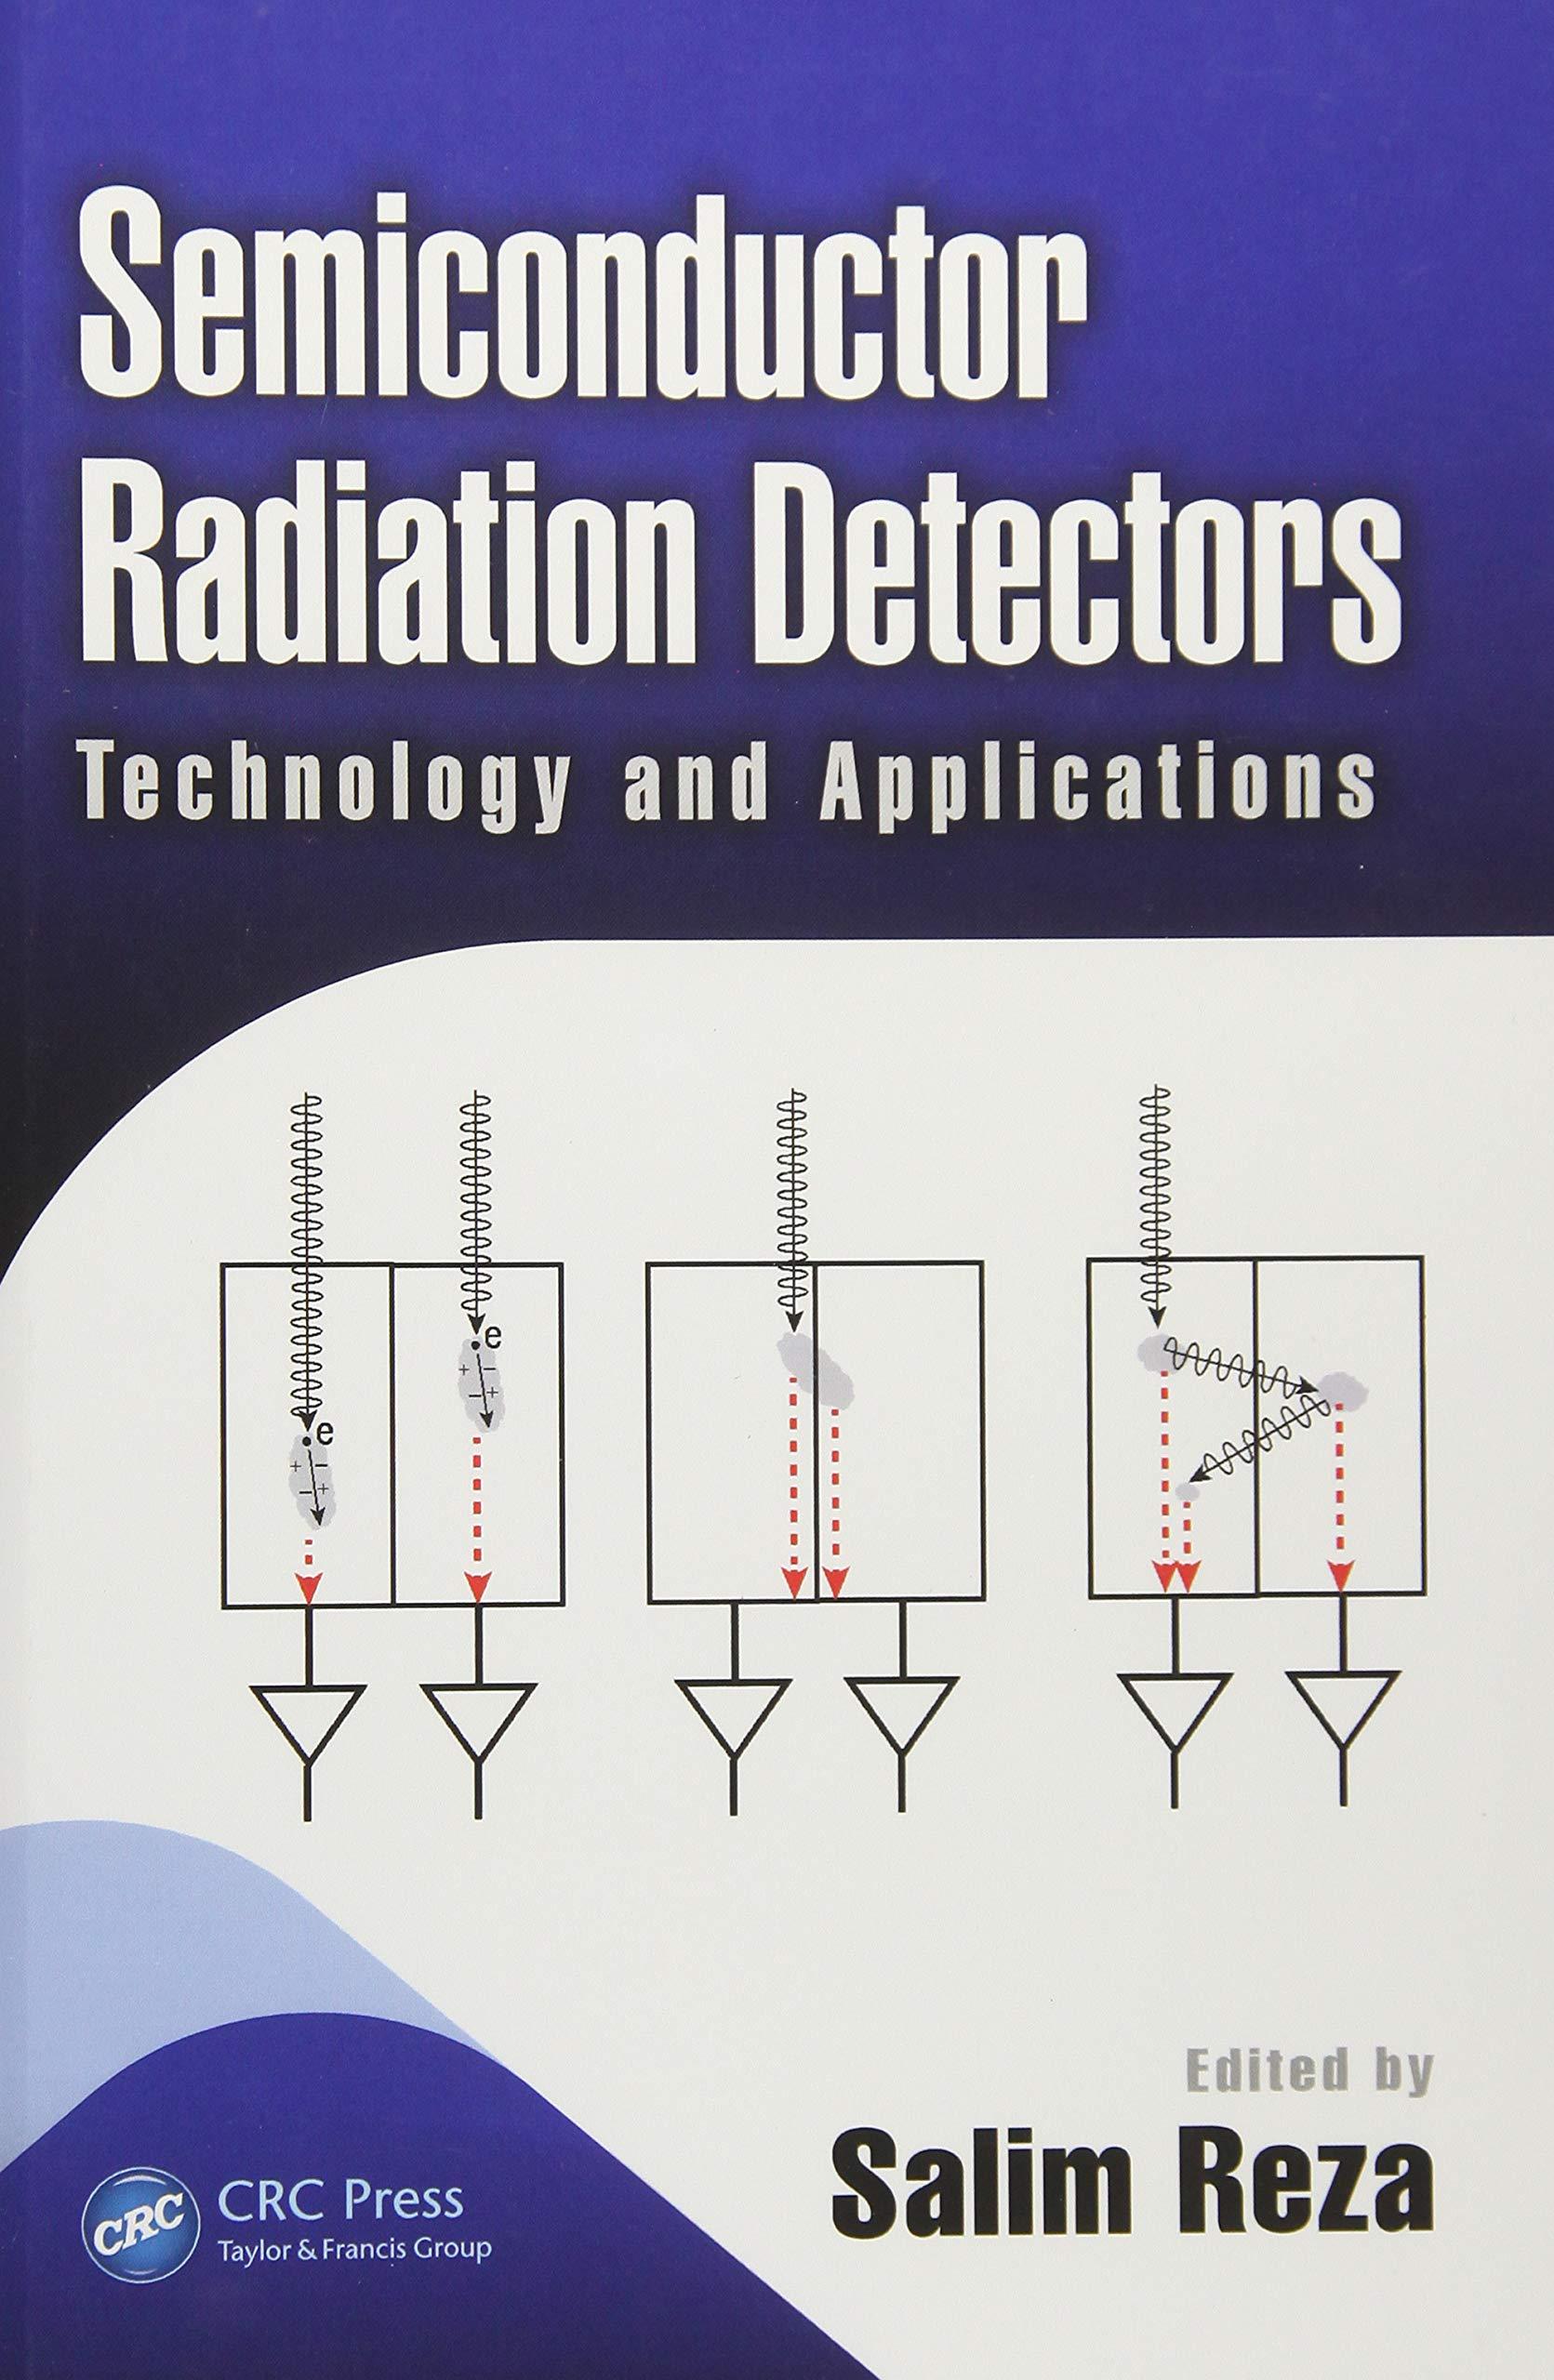 Semiconductor Radiation Detectors: Technology and Applications Devices, Circuits, and Systems: Amazon.es: Salim Reza: Libros en idiomas extranjeros